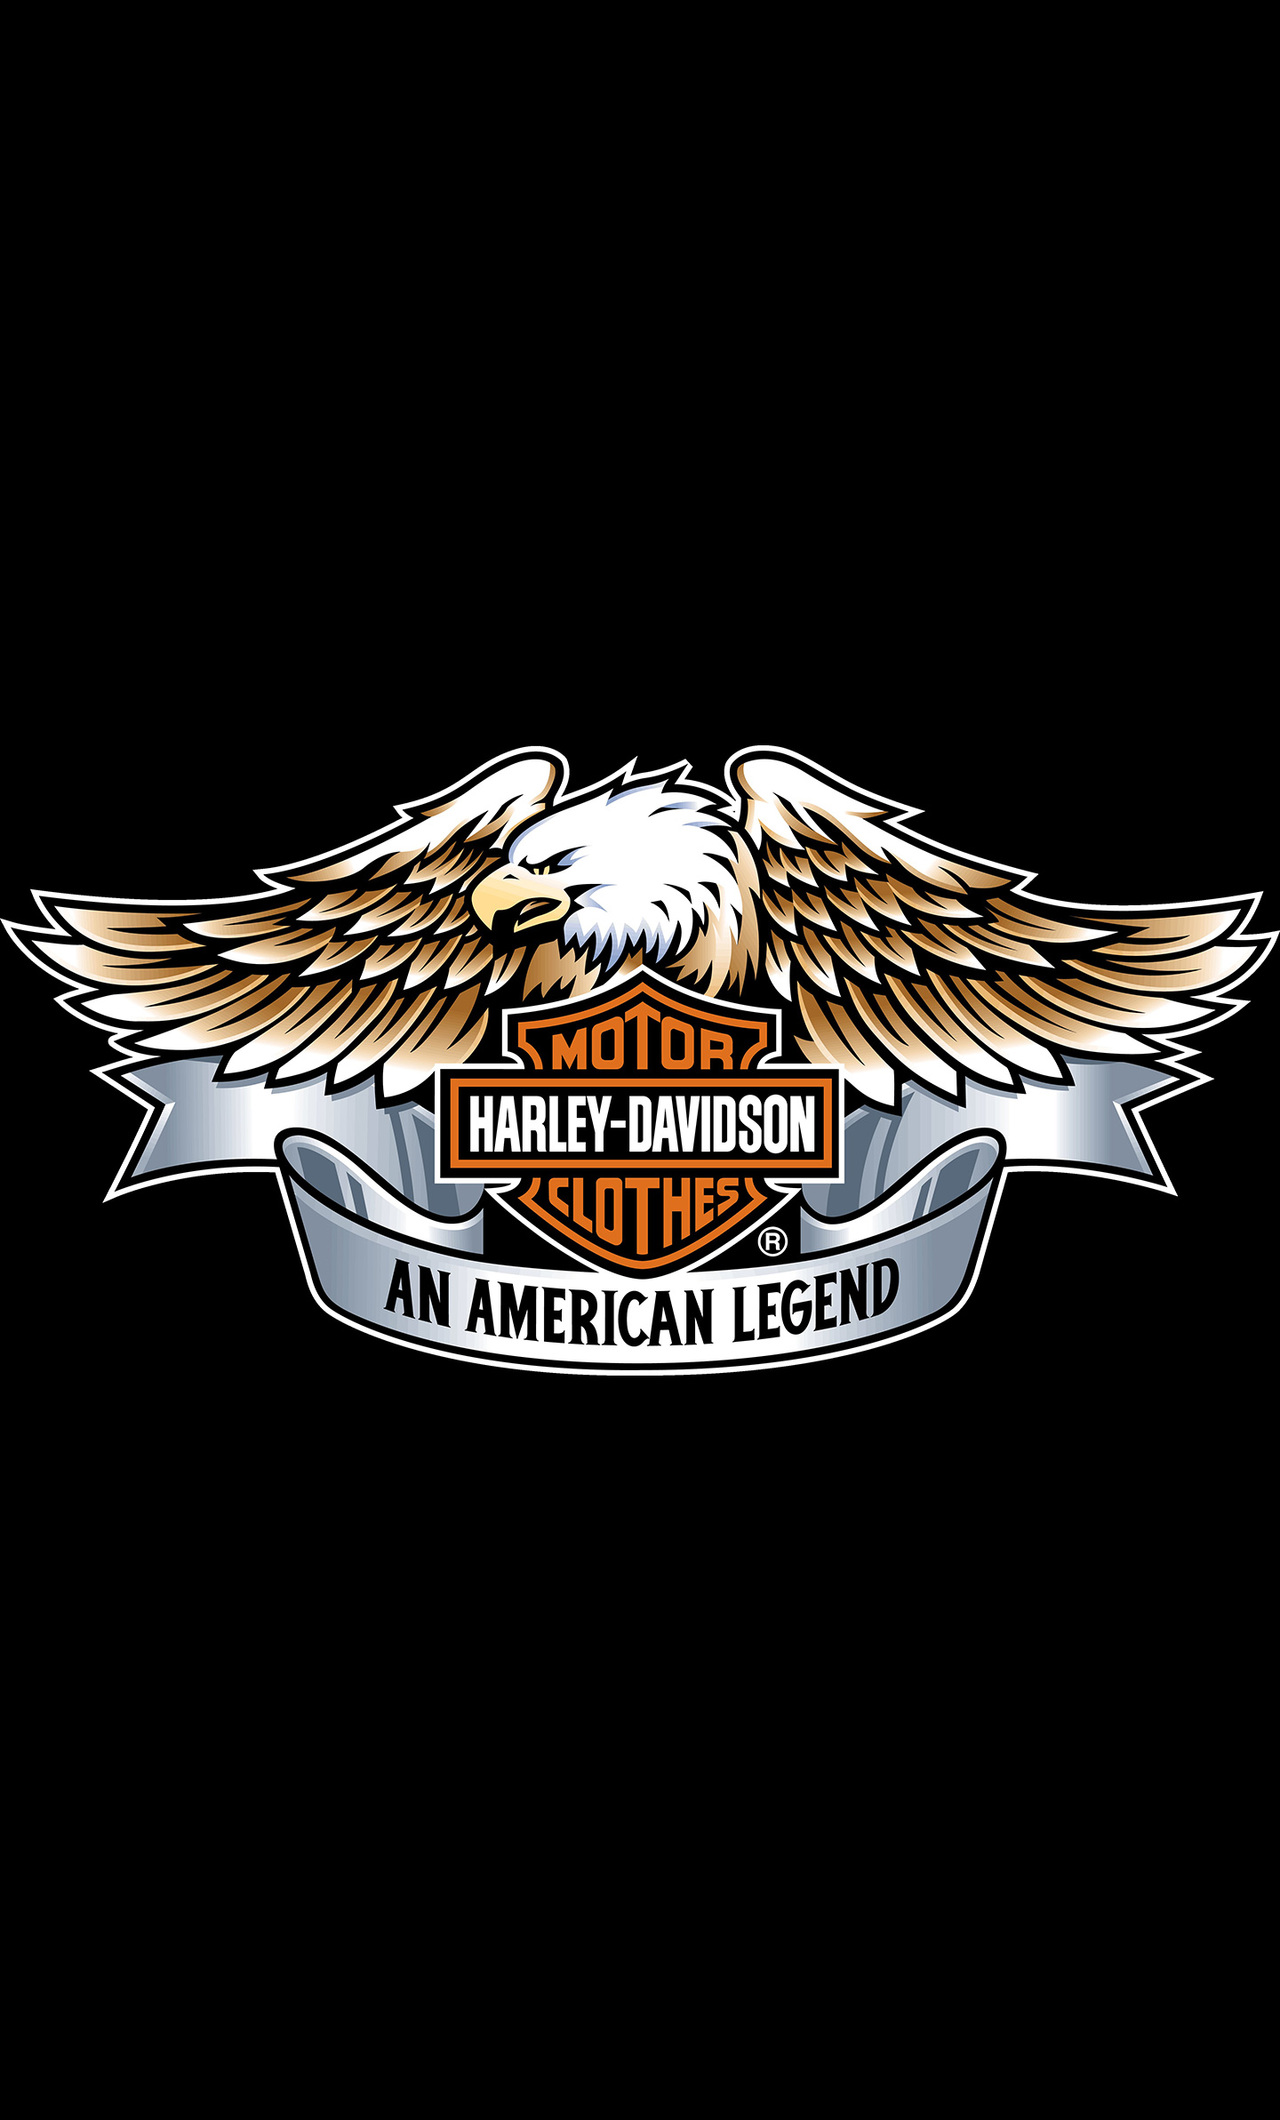 1280x2120 Harley Davidson Eagle Logo 4k Iphone 6 Hd 4k Wallpapers